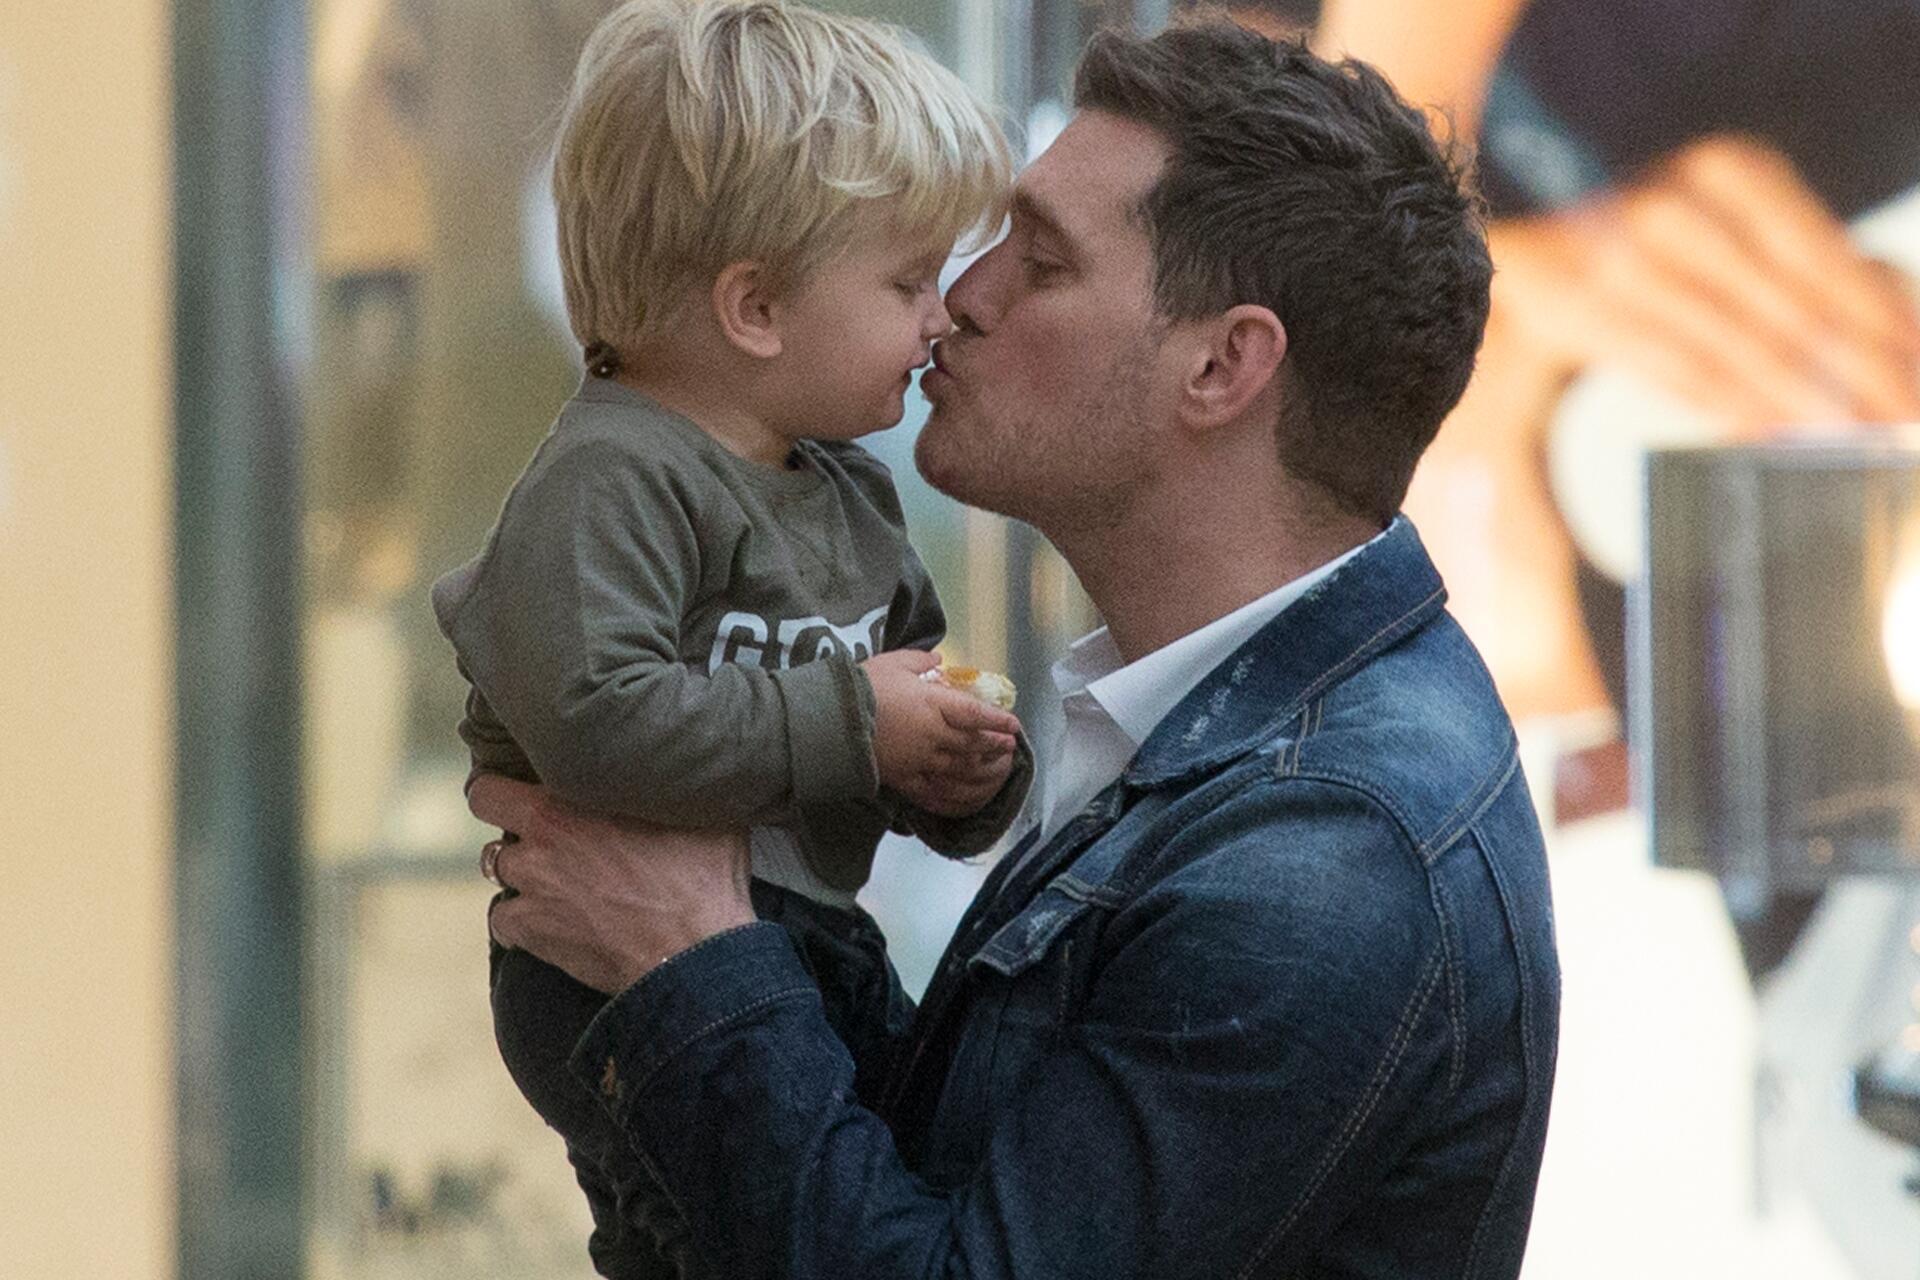 Bild zu Michael Bublé, Sohn, Krebs